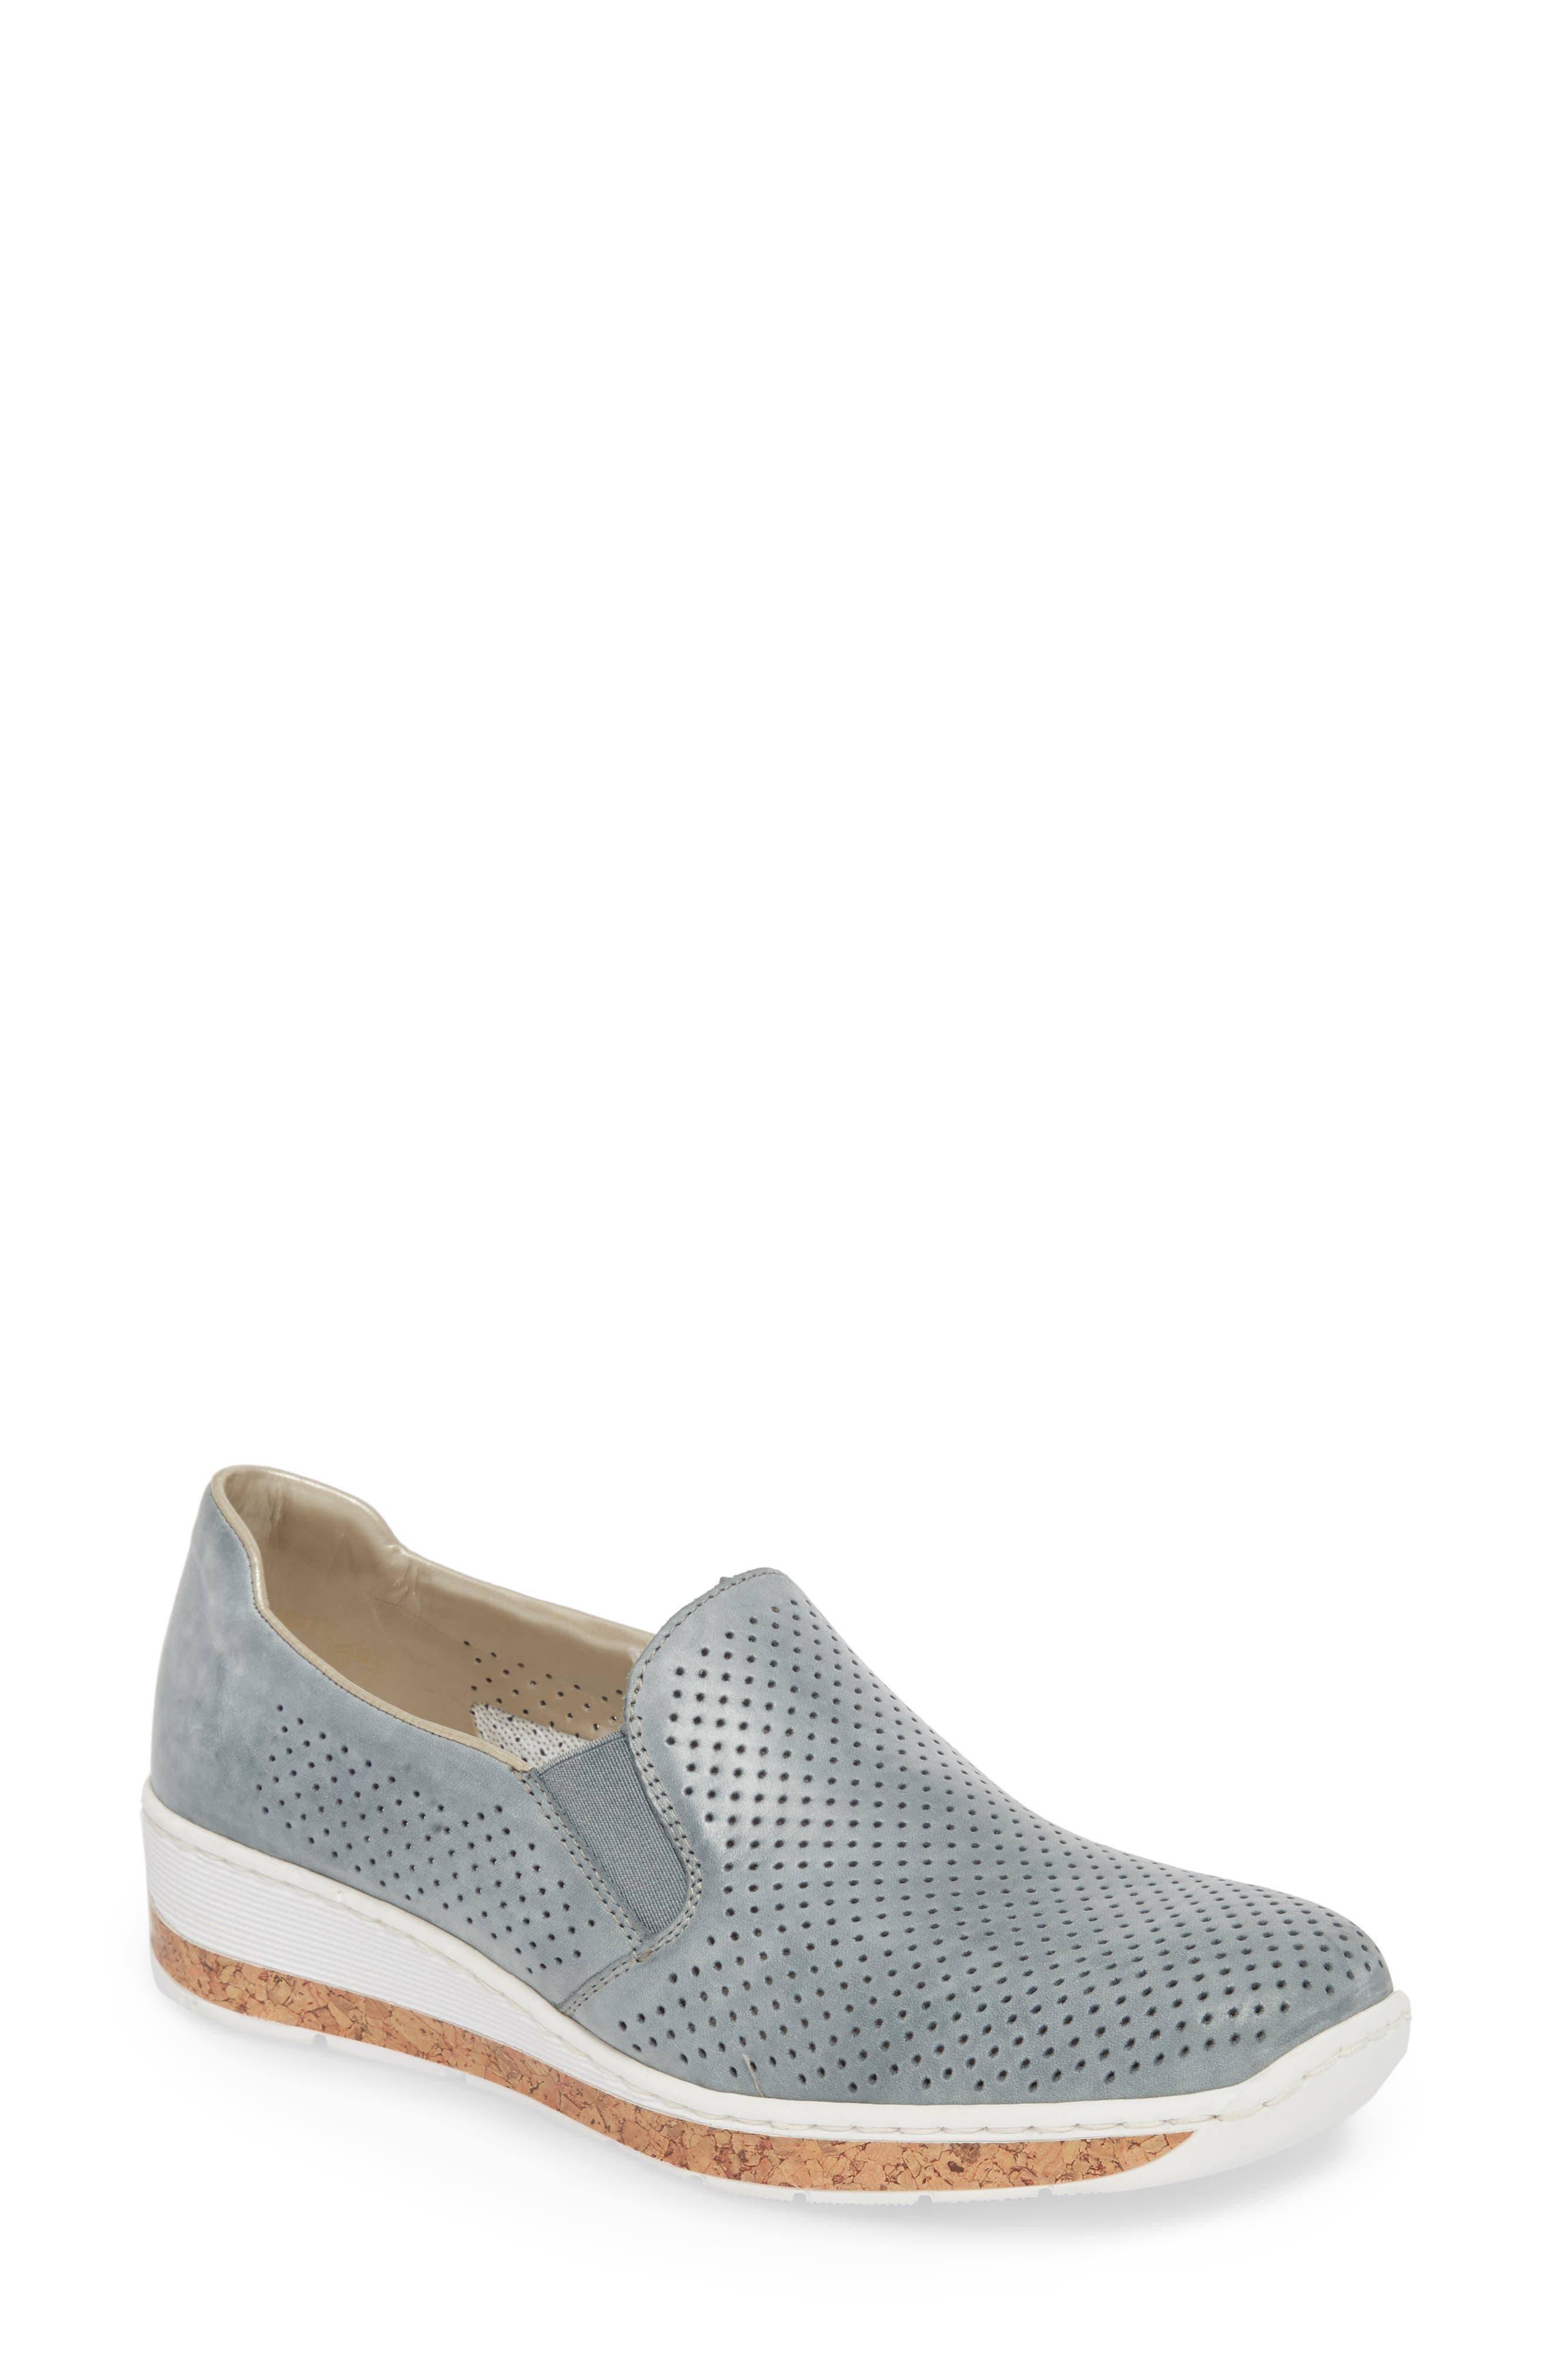 Doris 75 Wedge Sneaker,                         Main,                         color, Royal Faux Leather